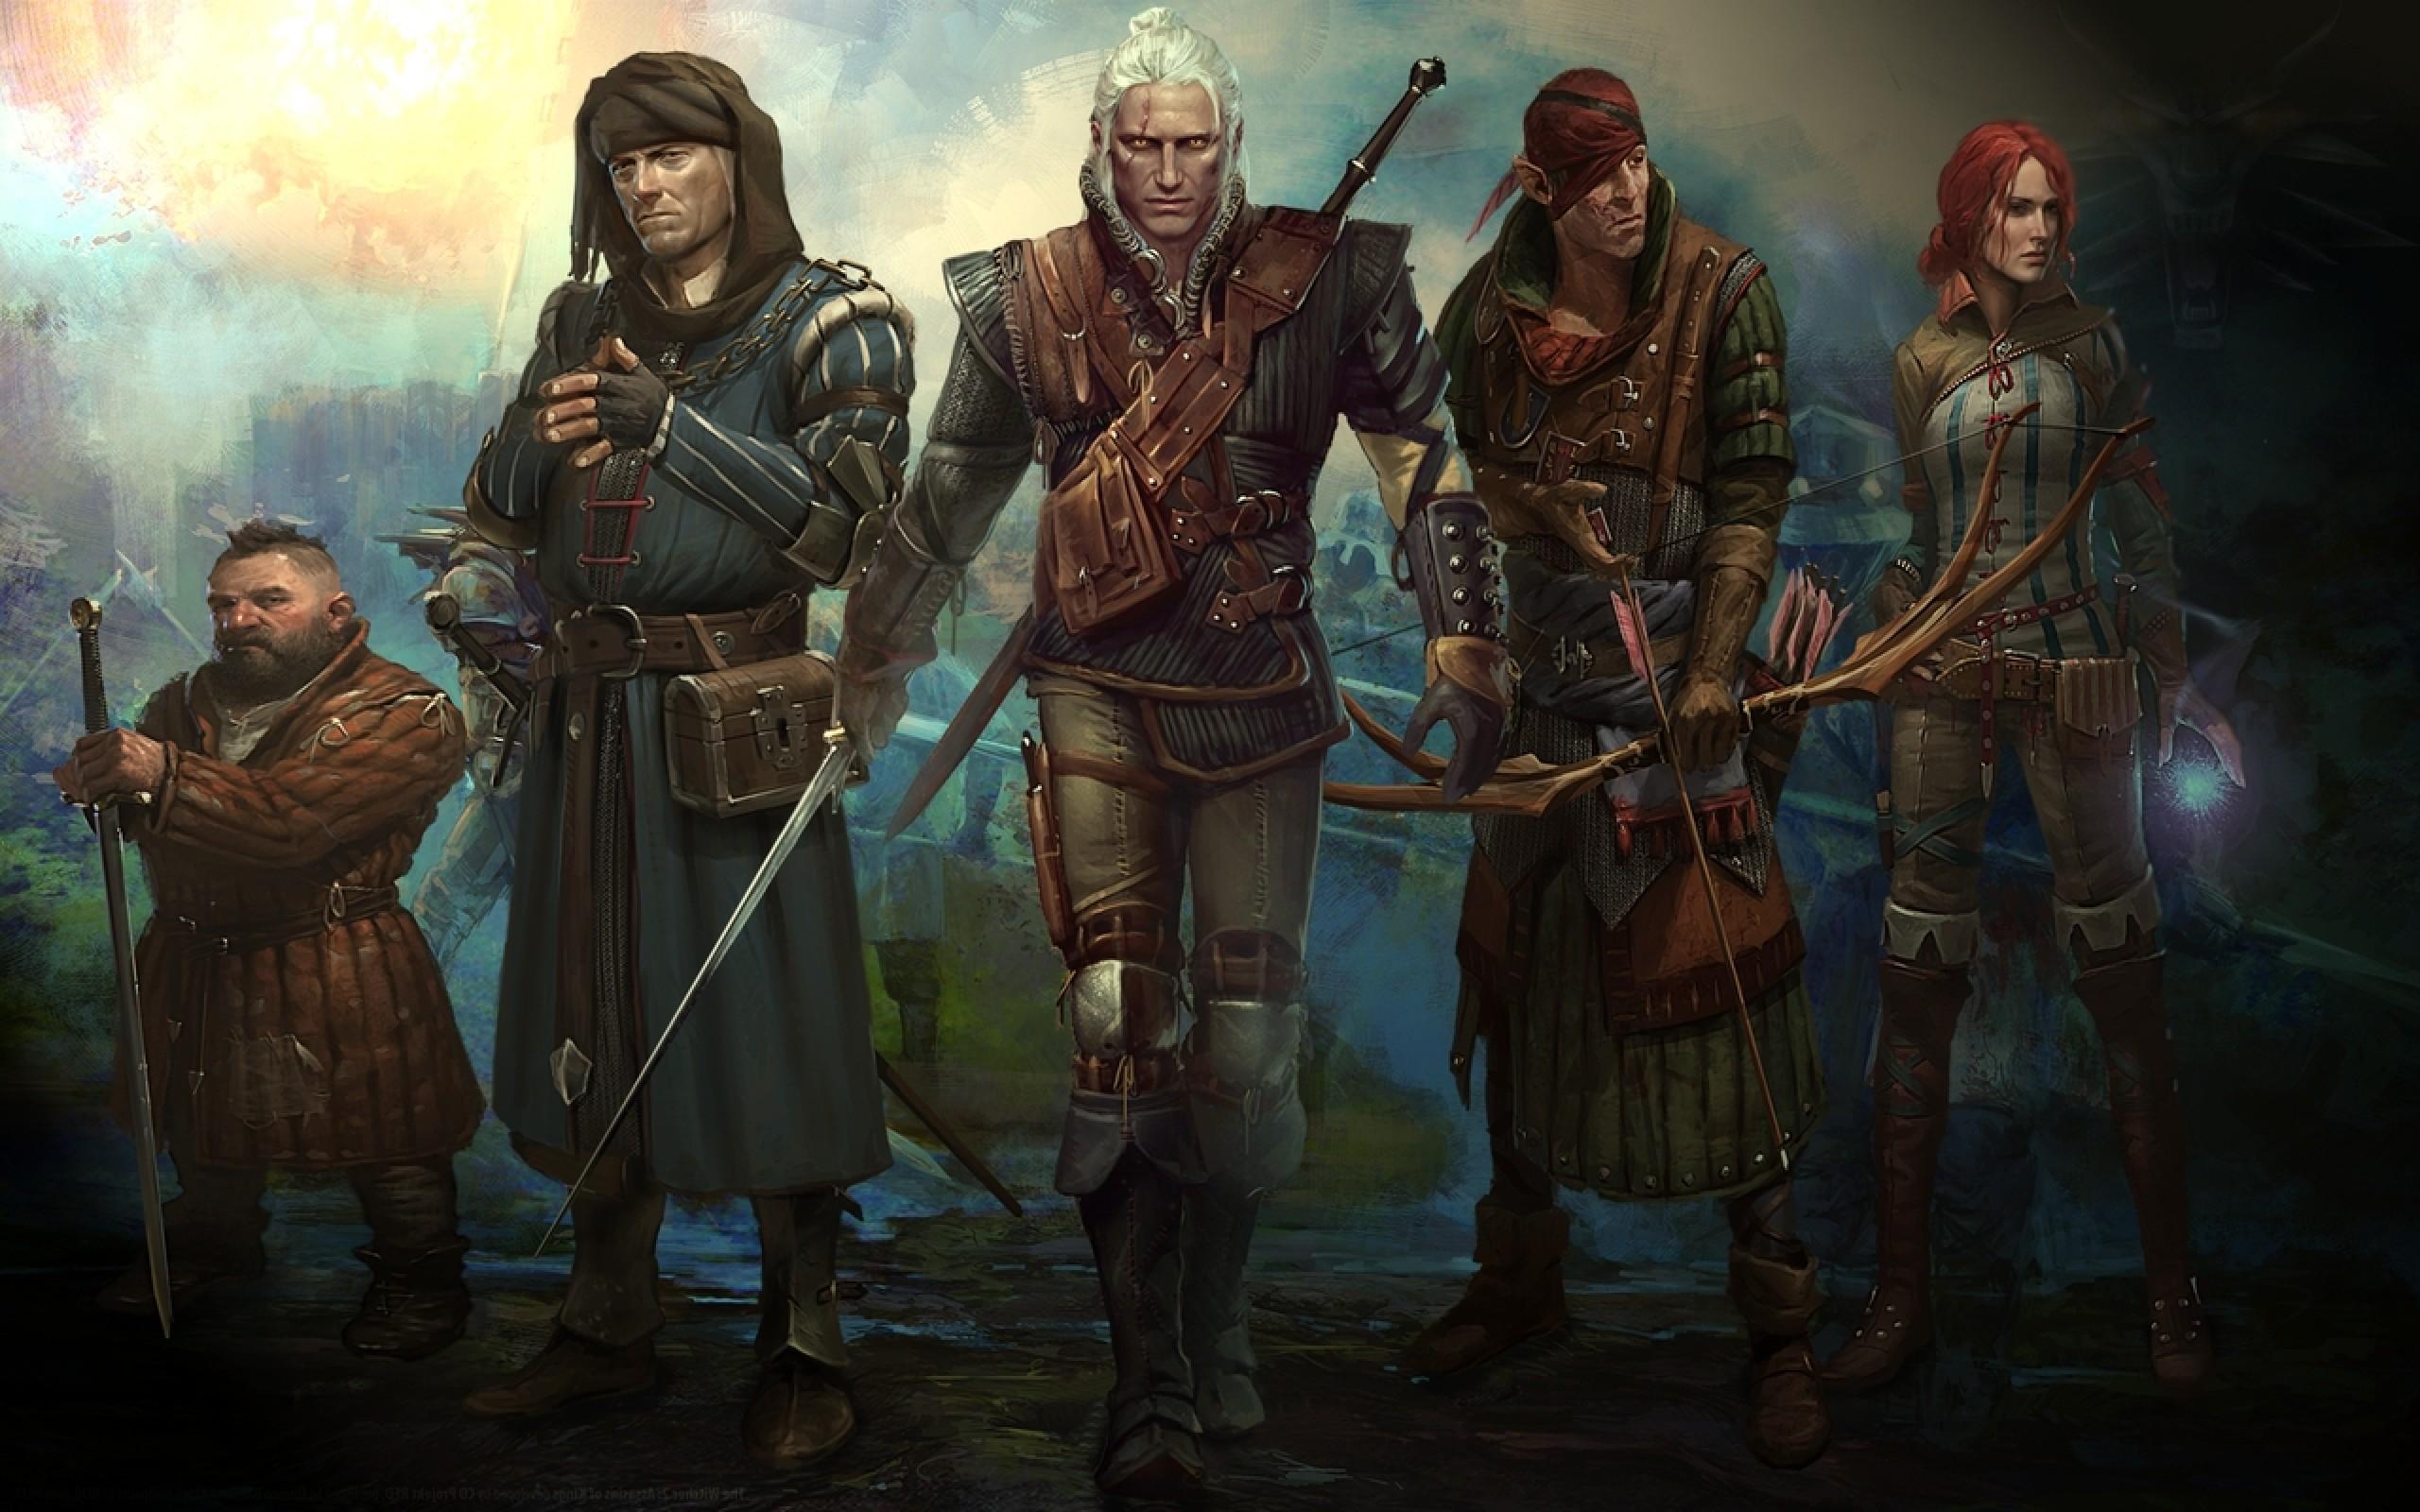 the witcher geralt of rivia the witcher 2 triss merigold geralt assassins  of kings iorveth zoltan